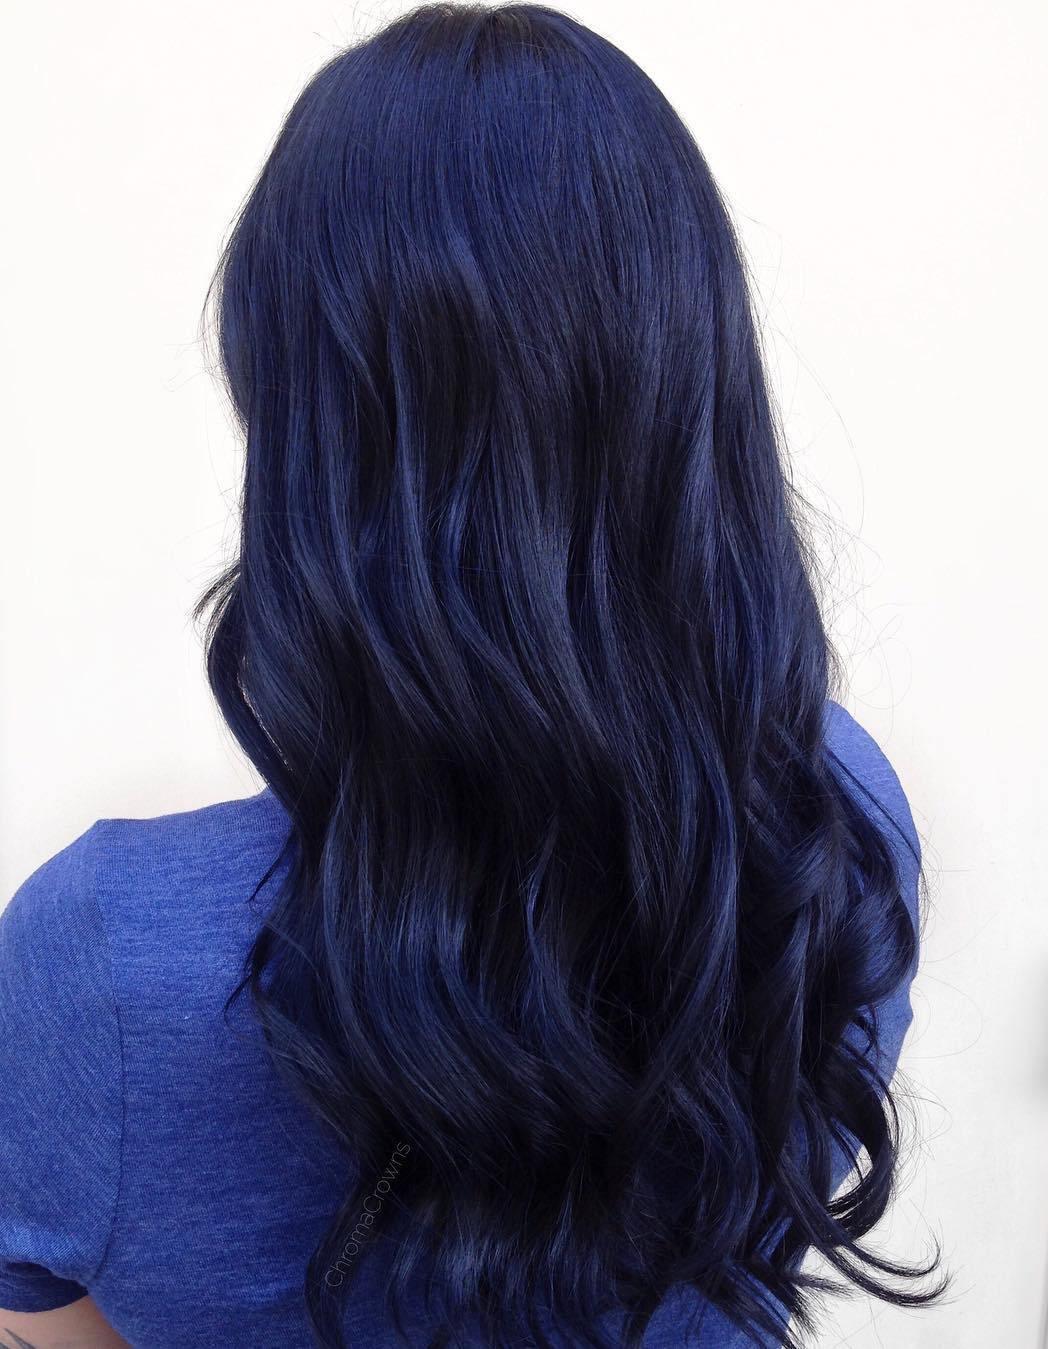 لون شعر اسود مزرق